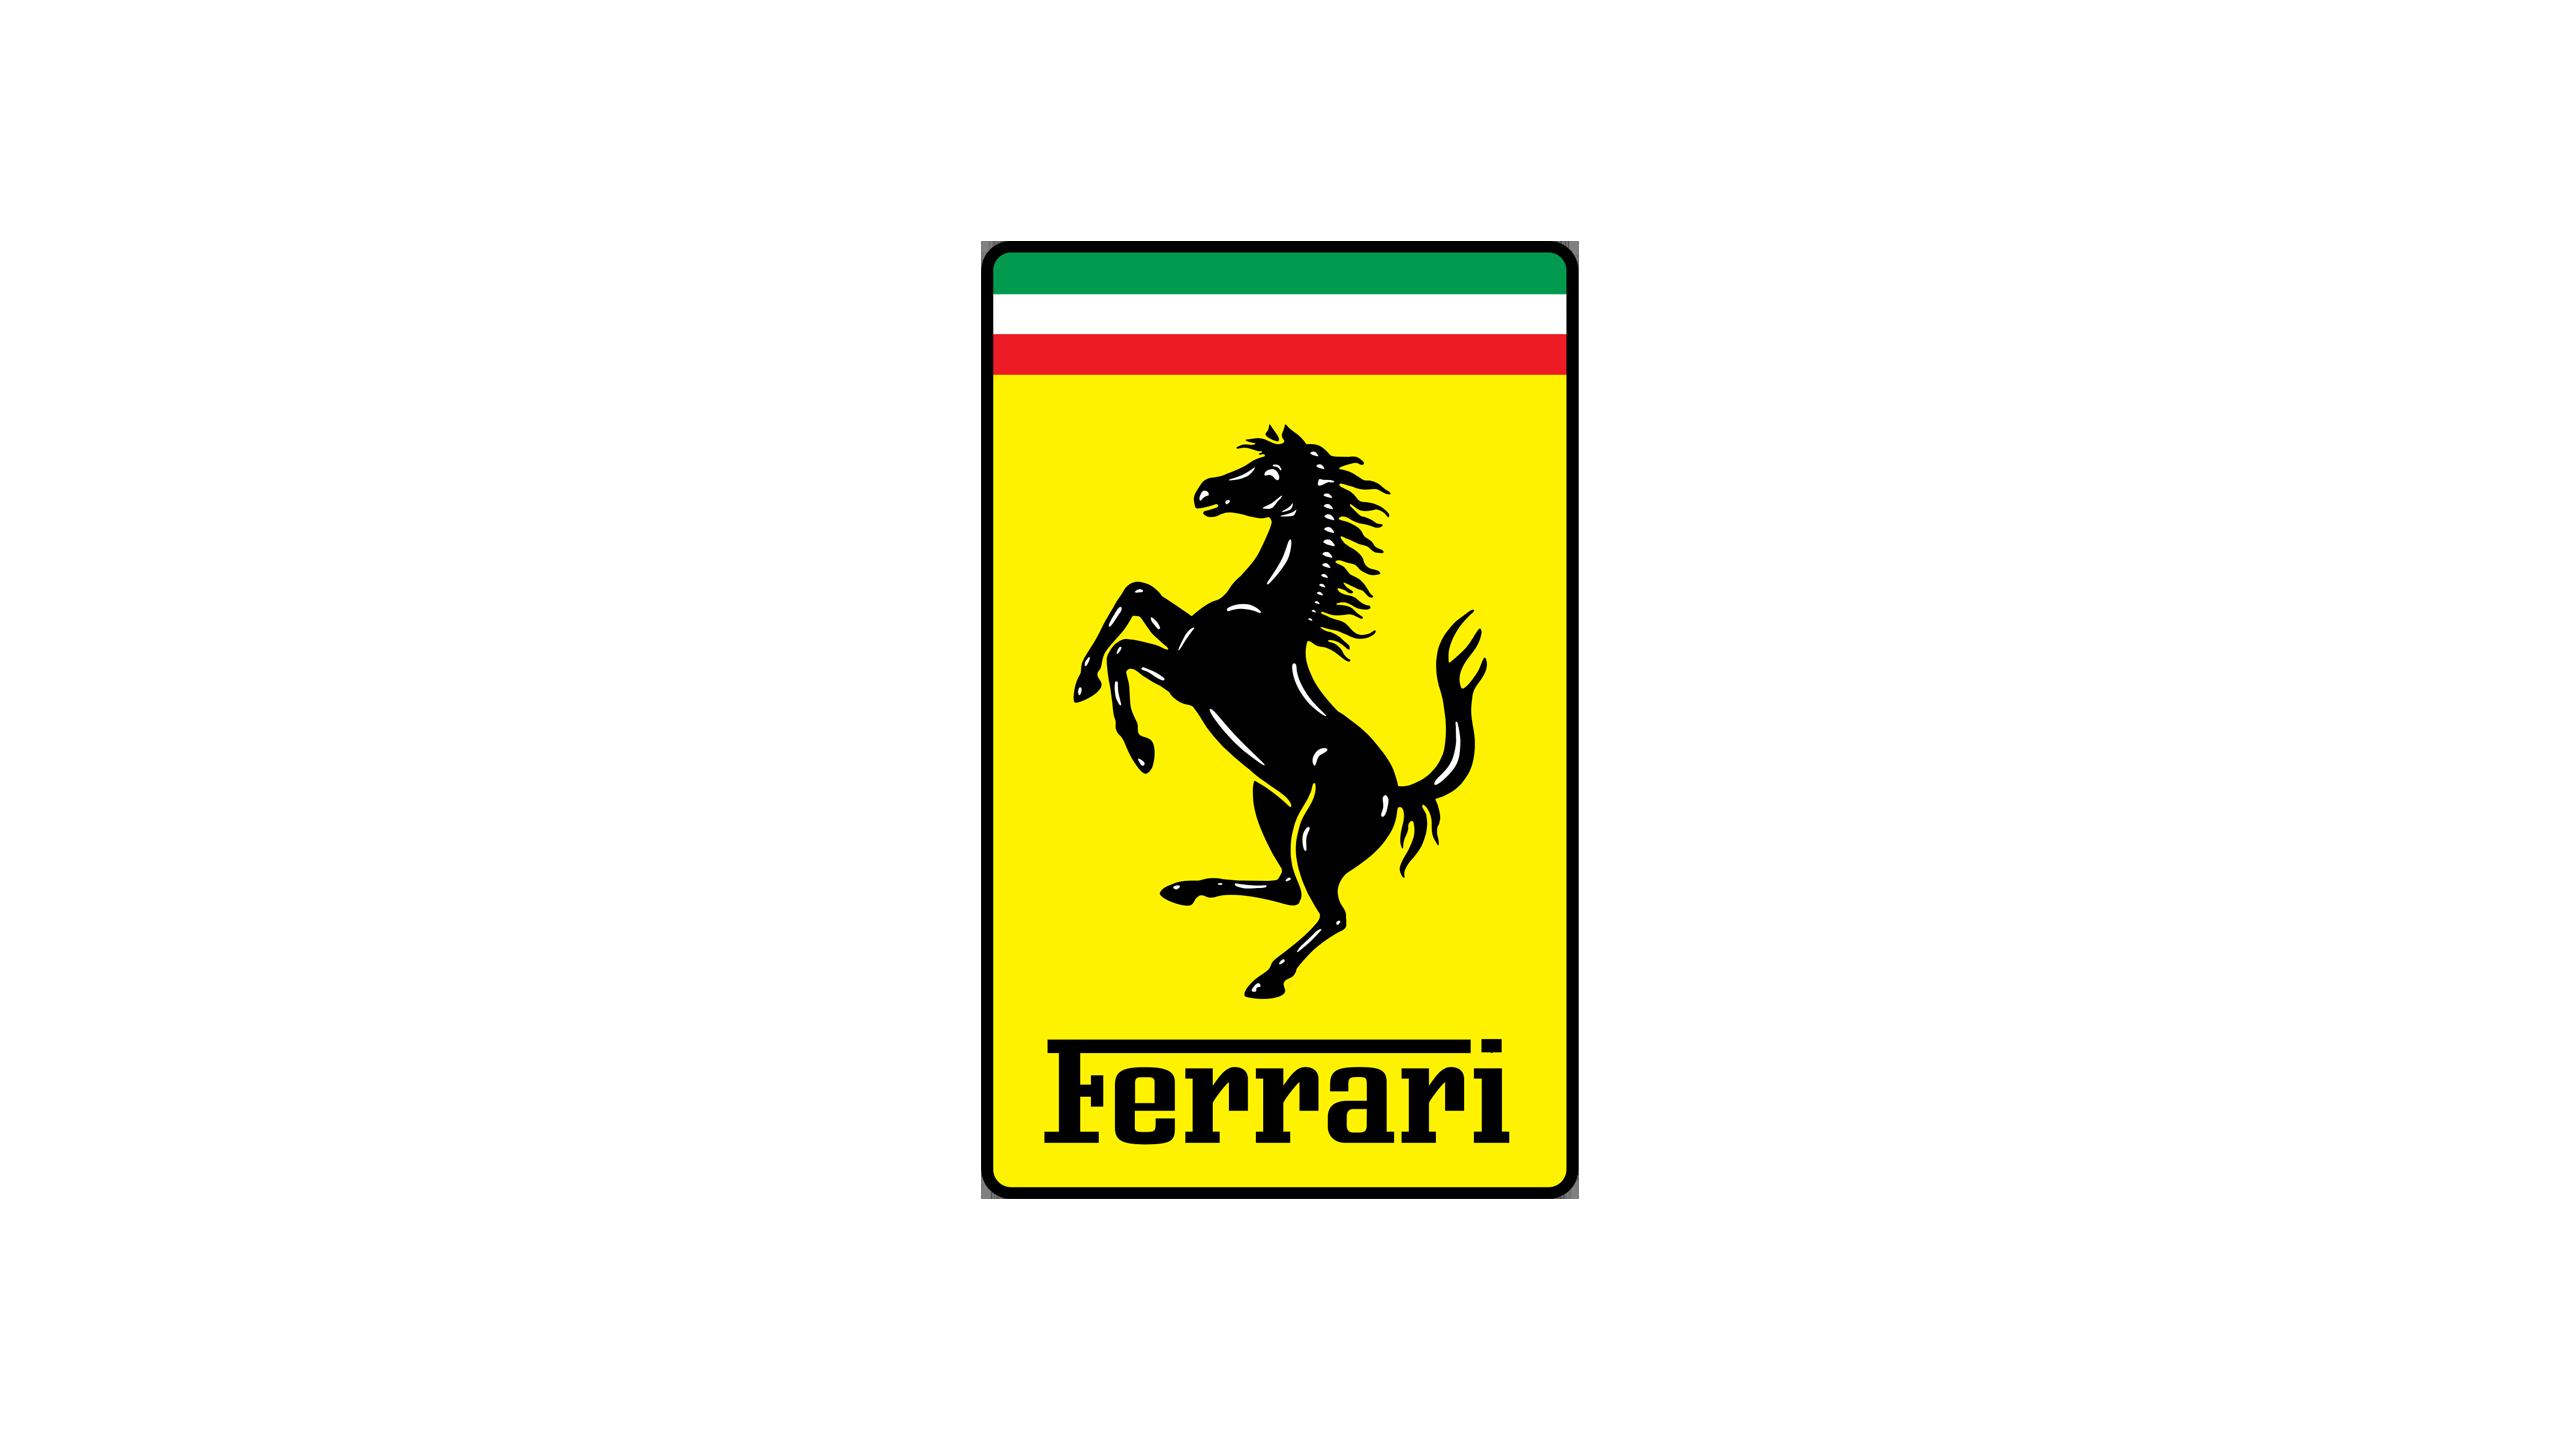 Ferrari logo png